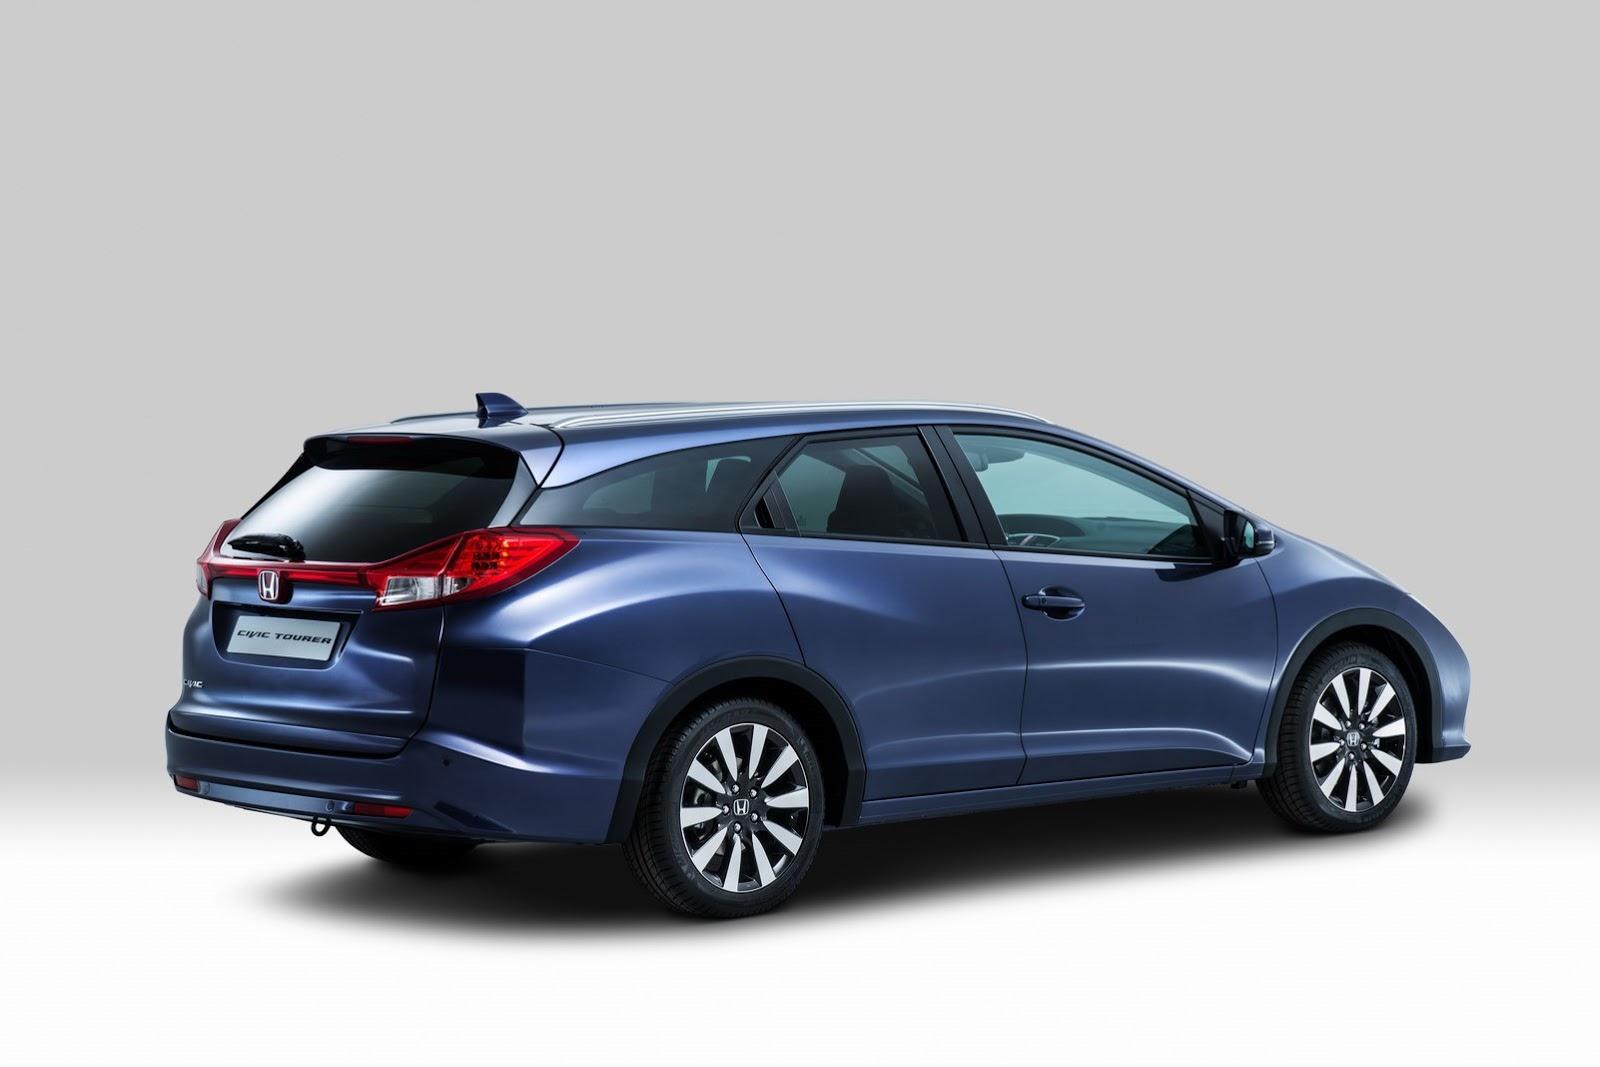 Honda Accord Evolution >> Honda Presents New Civic Tourer Ahead of Frankfurt Debut - autoevolution